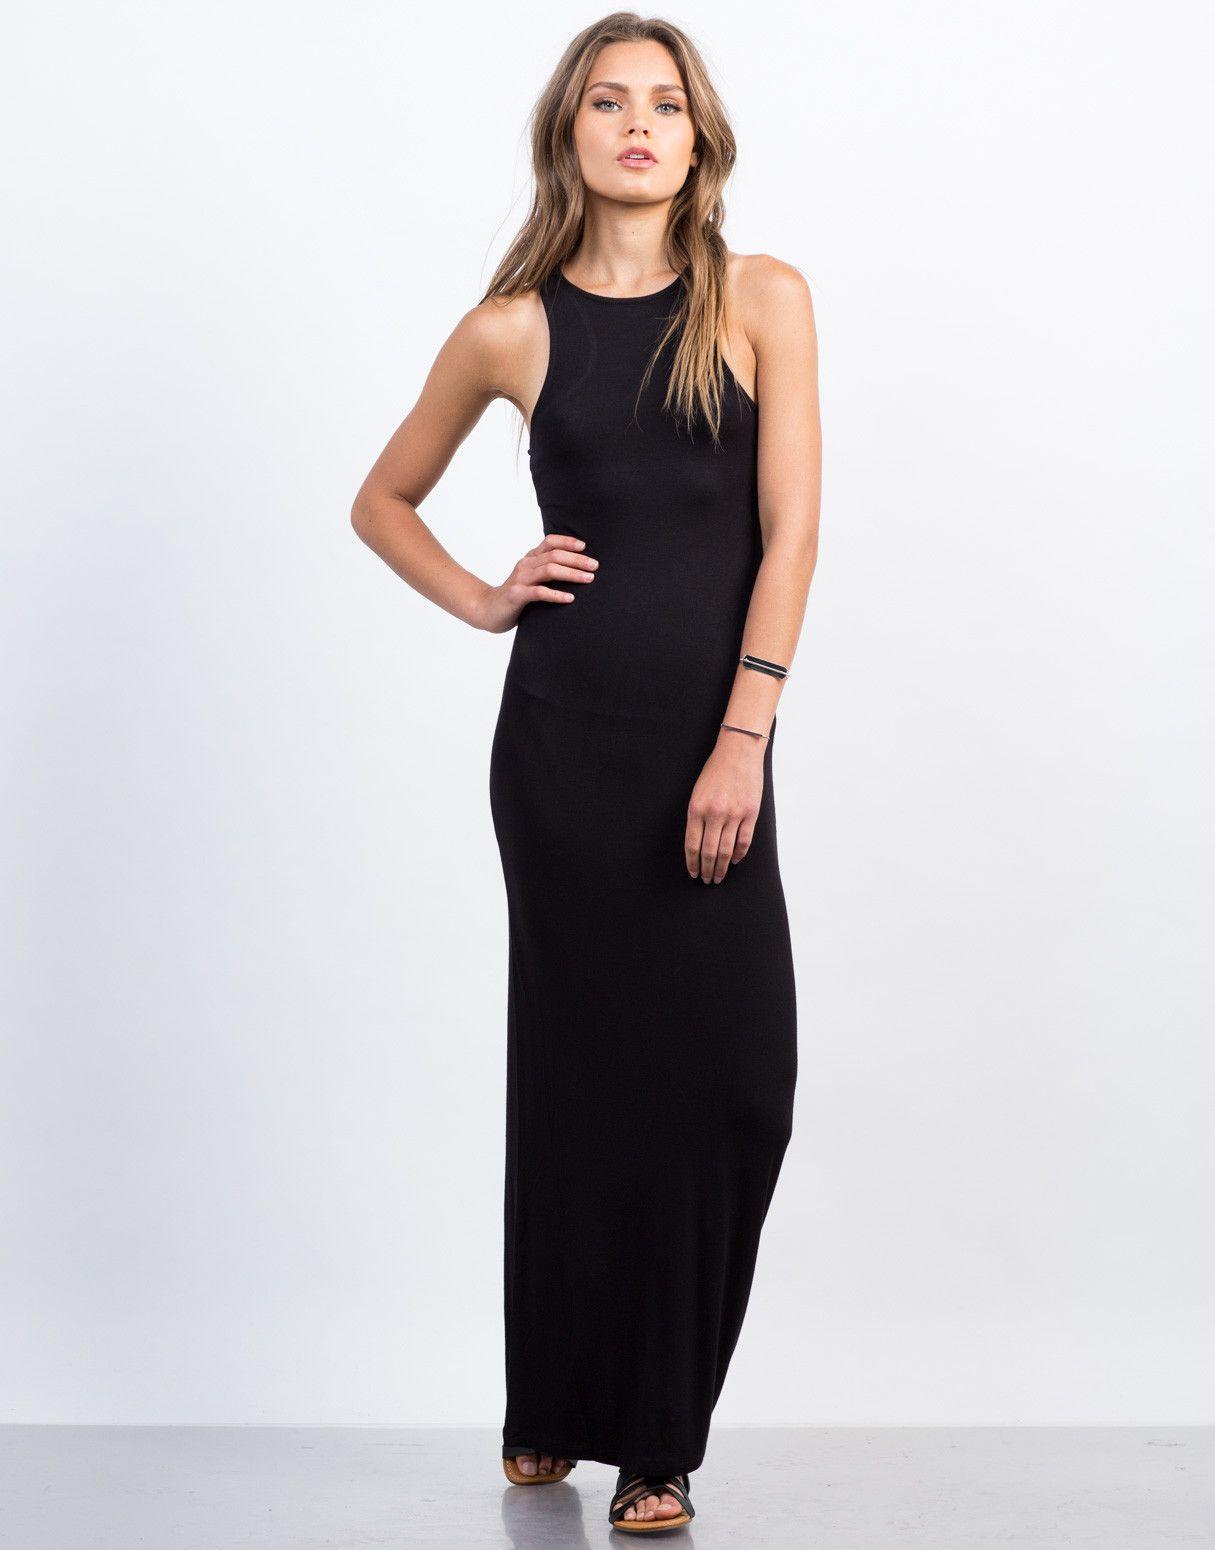 Racerback Maxi Dress Maxi Dress Racerback Maxi Dress Simple Dresses [ 1550 x 1215 Pixel ]